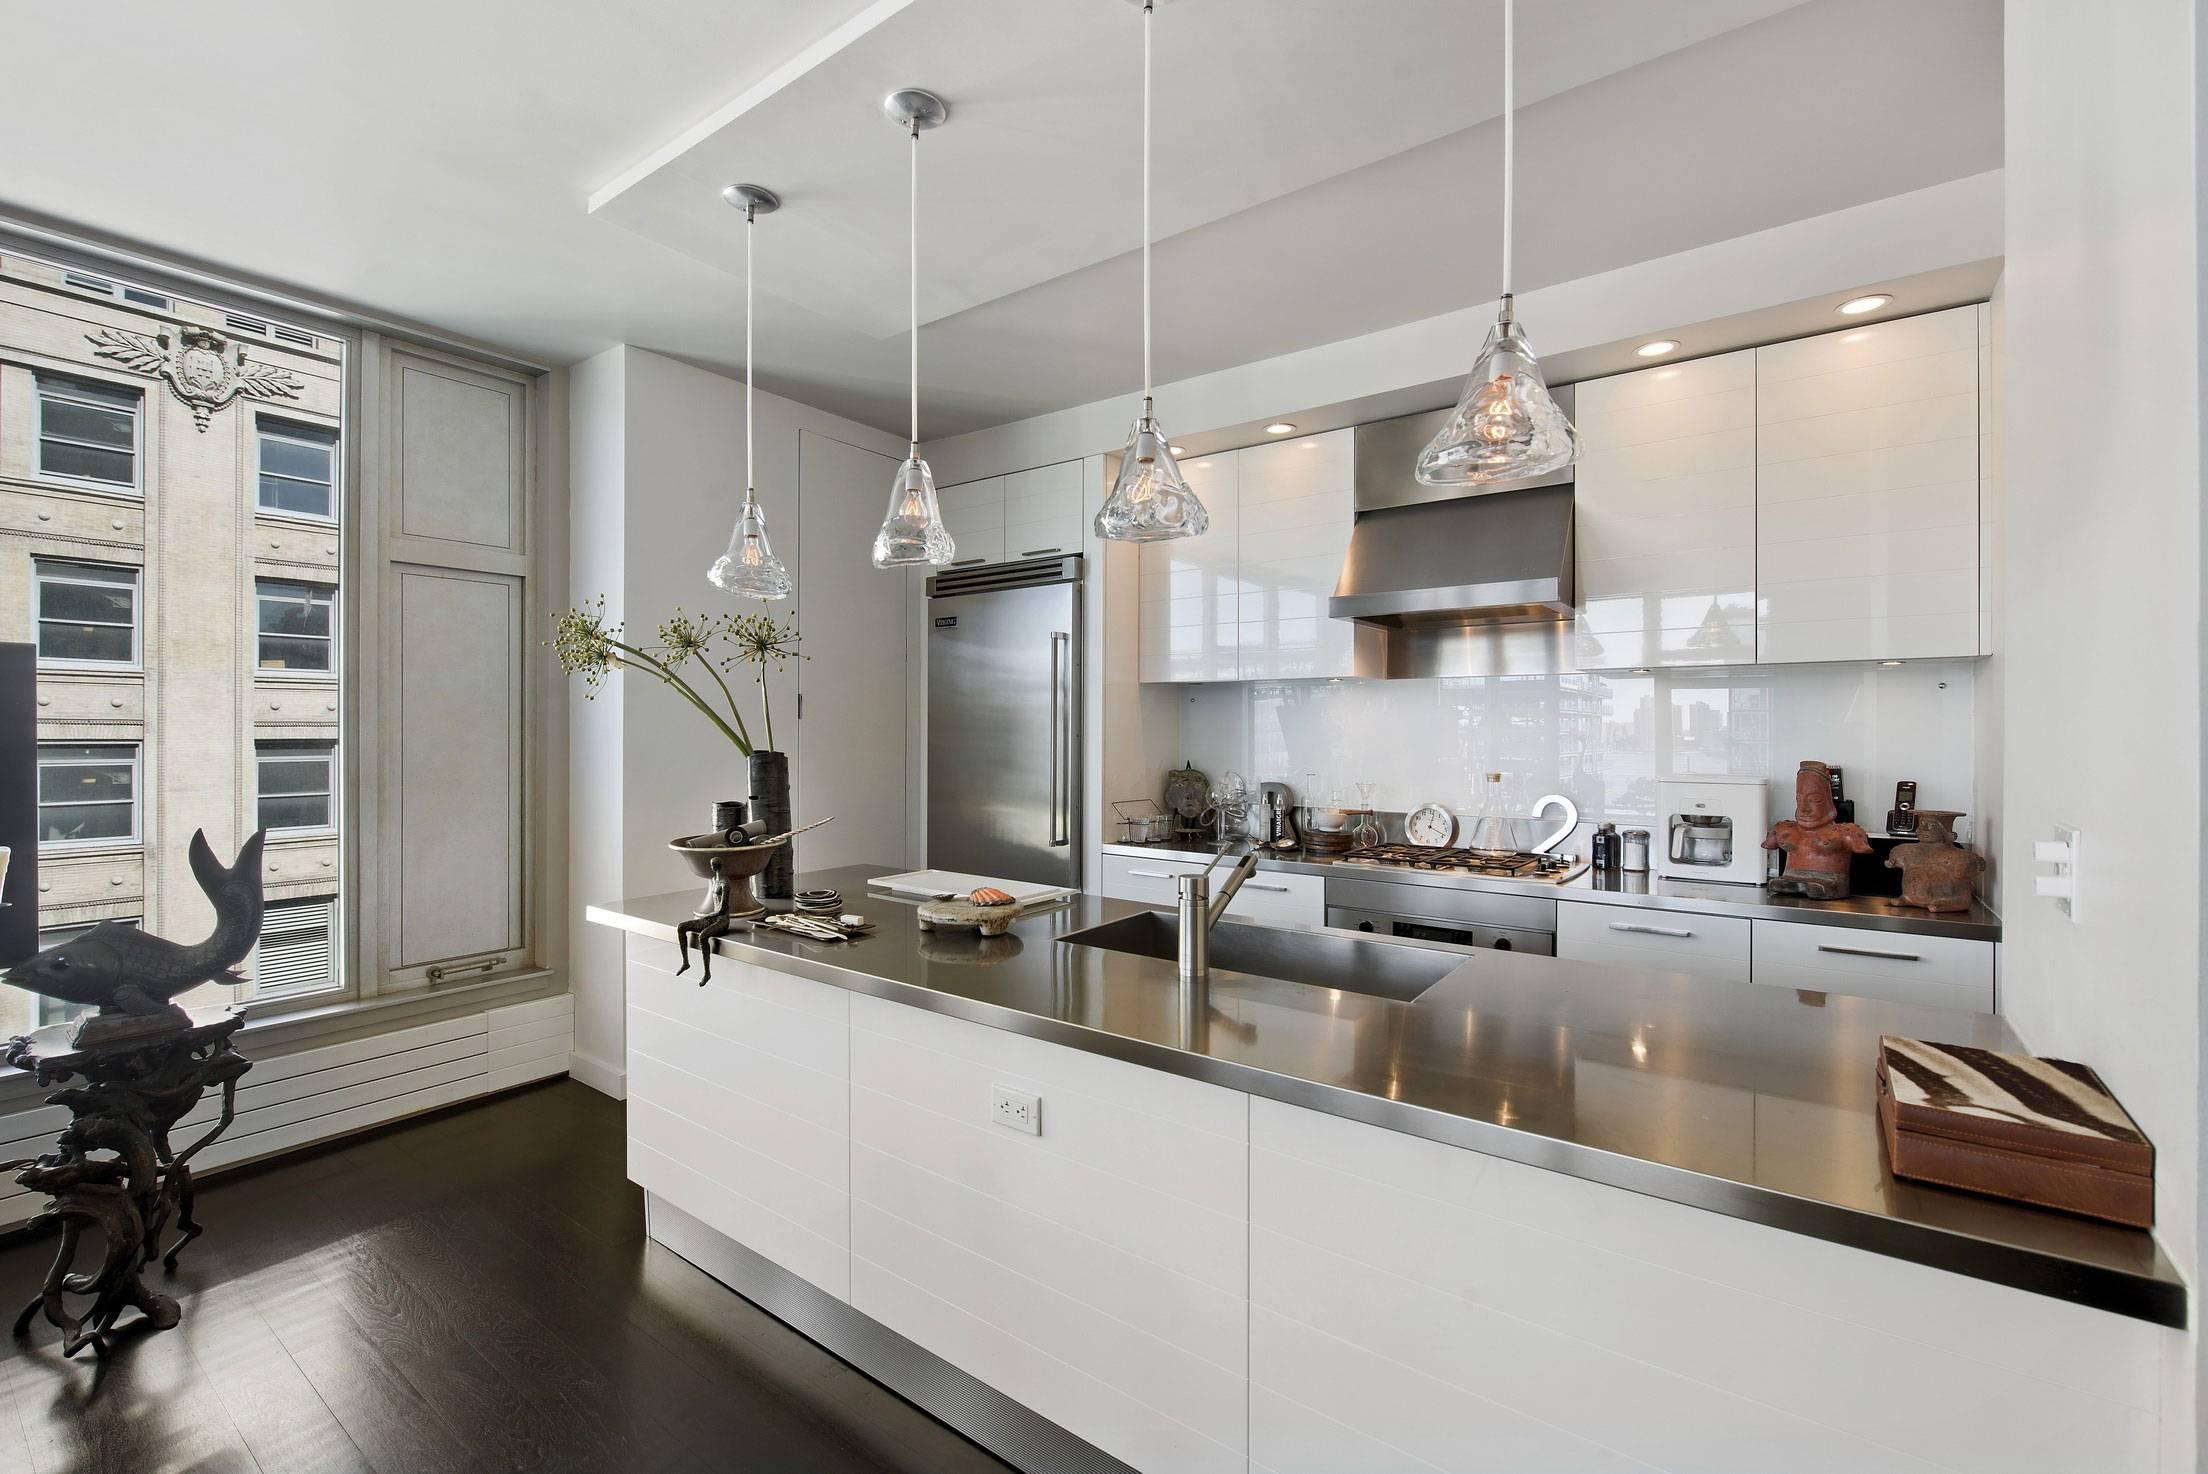 Stainless Steel Kitchen Pendant Light ~ Picgit throughout Stainless Steel Kitchen Pendant Lights (Image 13 of 15)